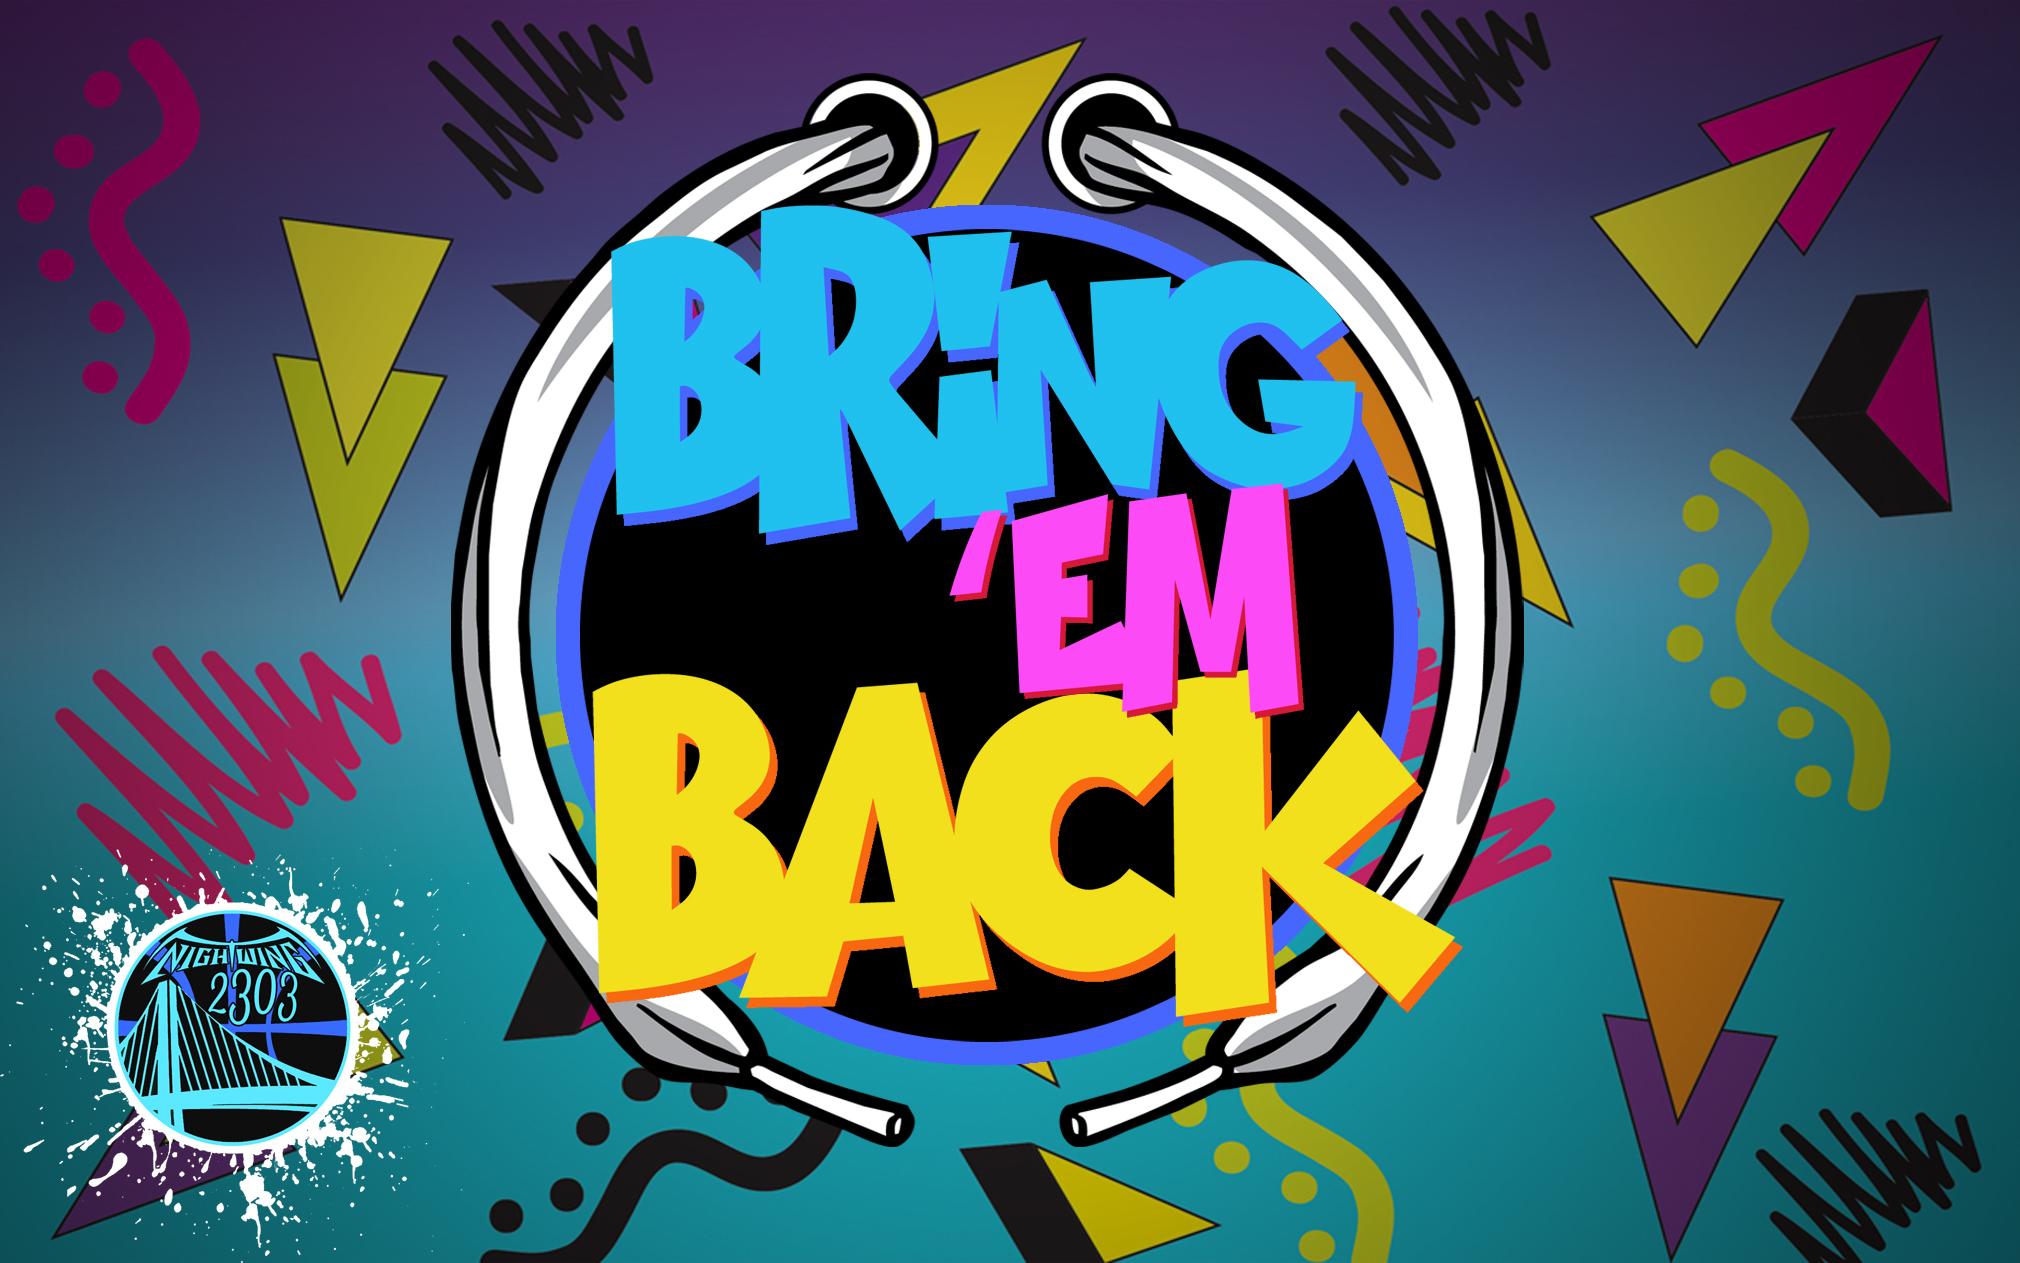 BringEmBack-Thumbainl